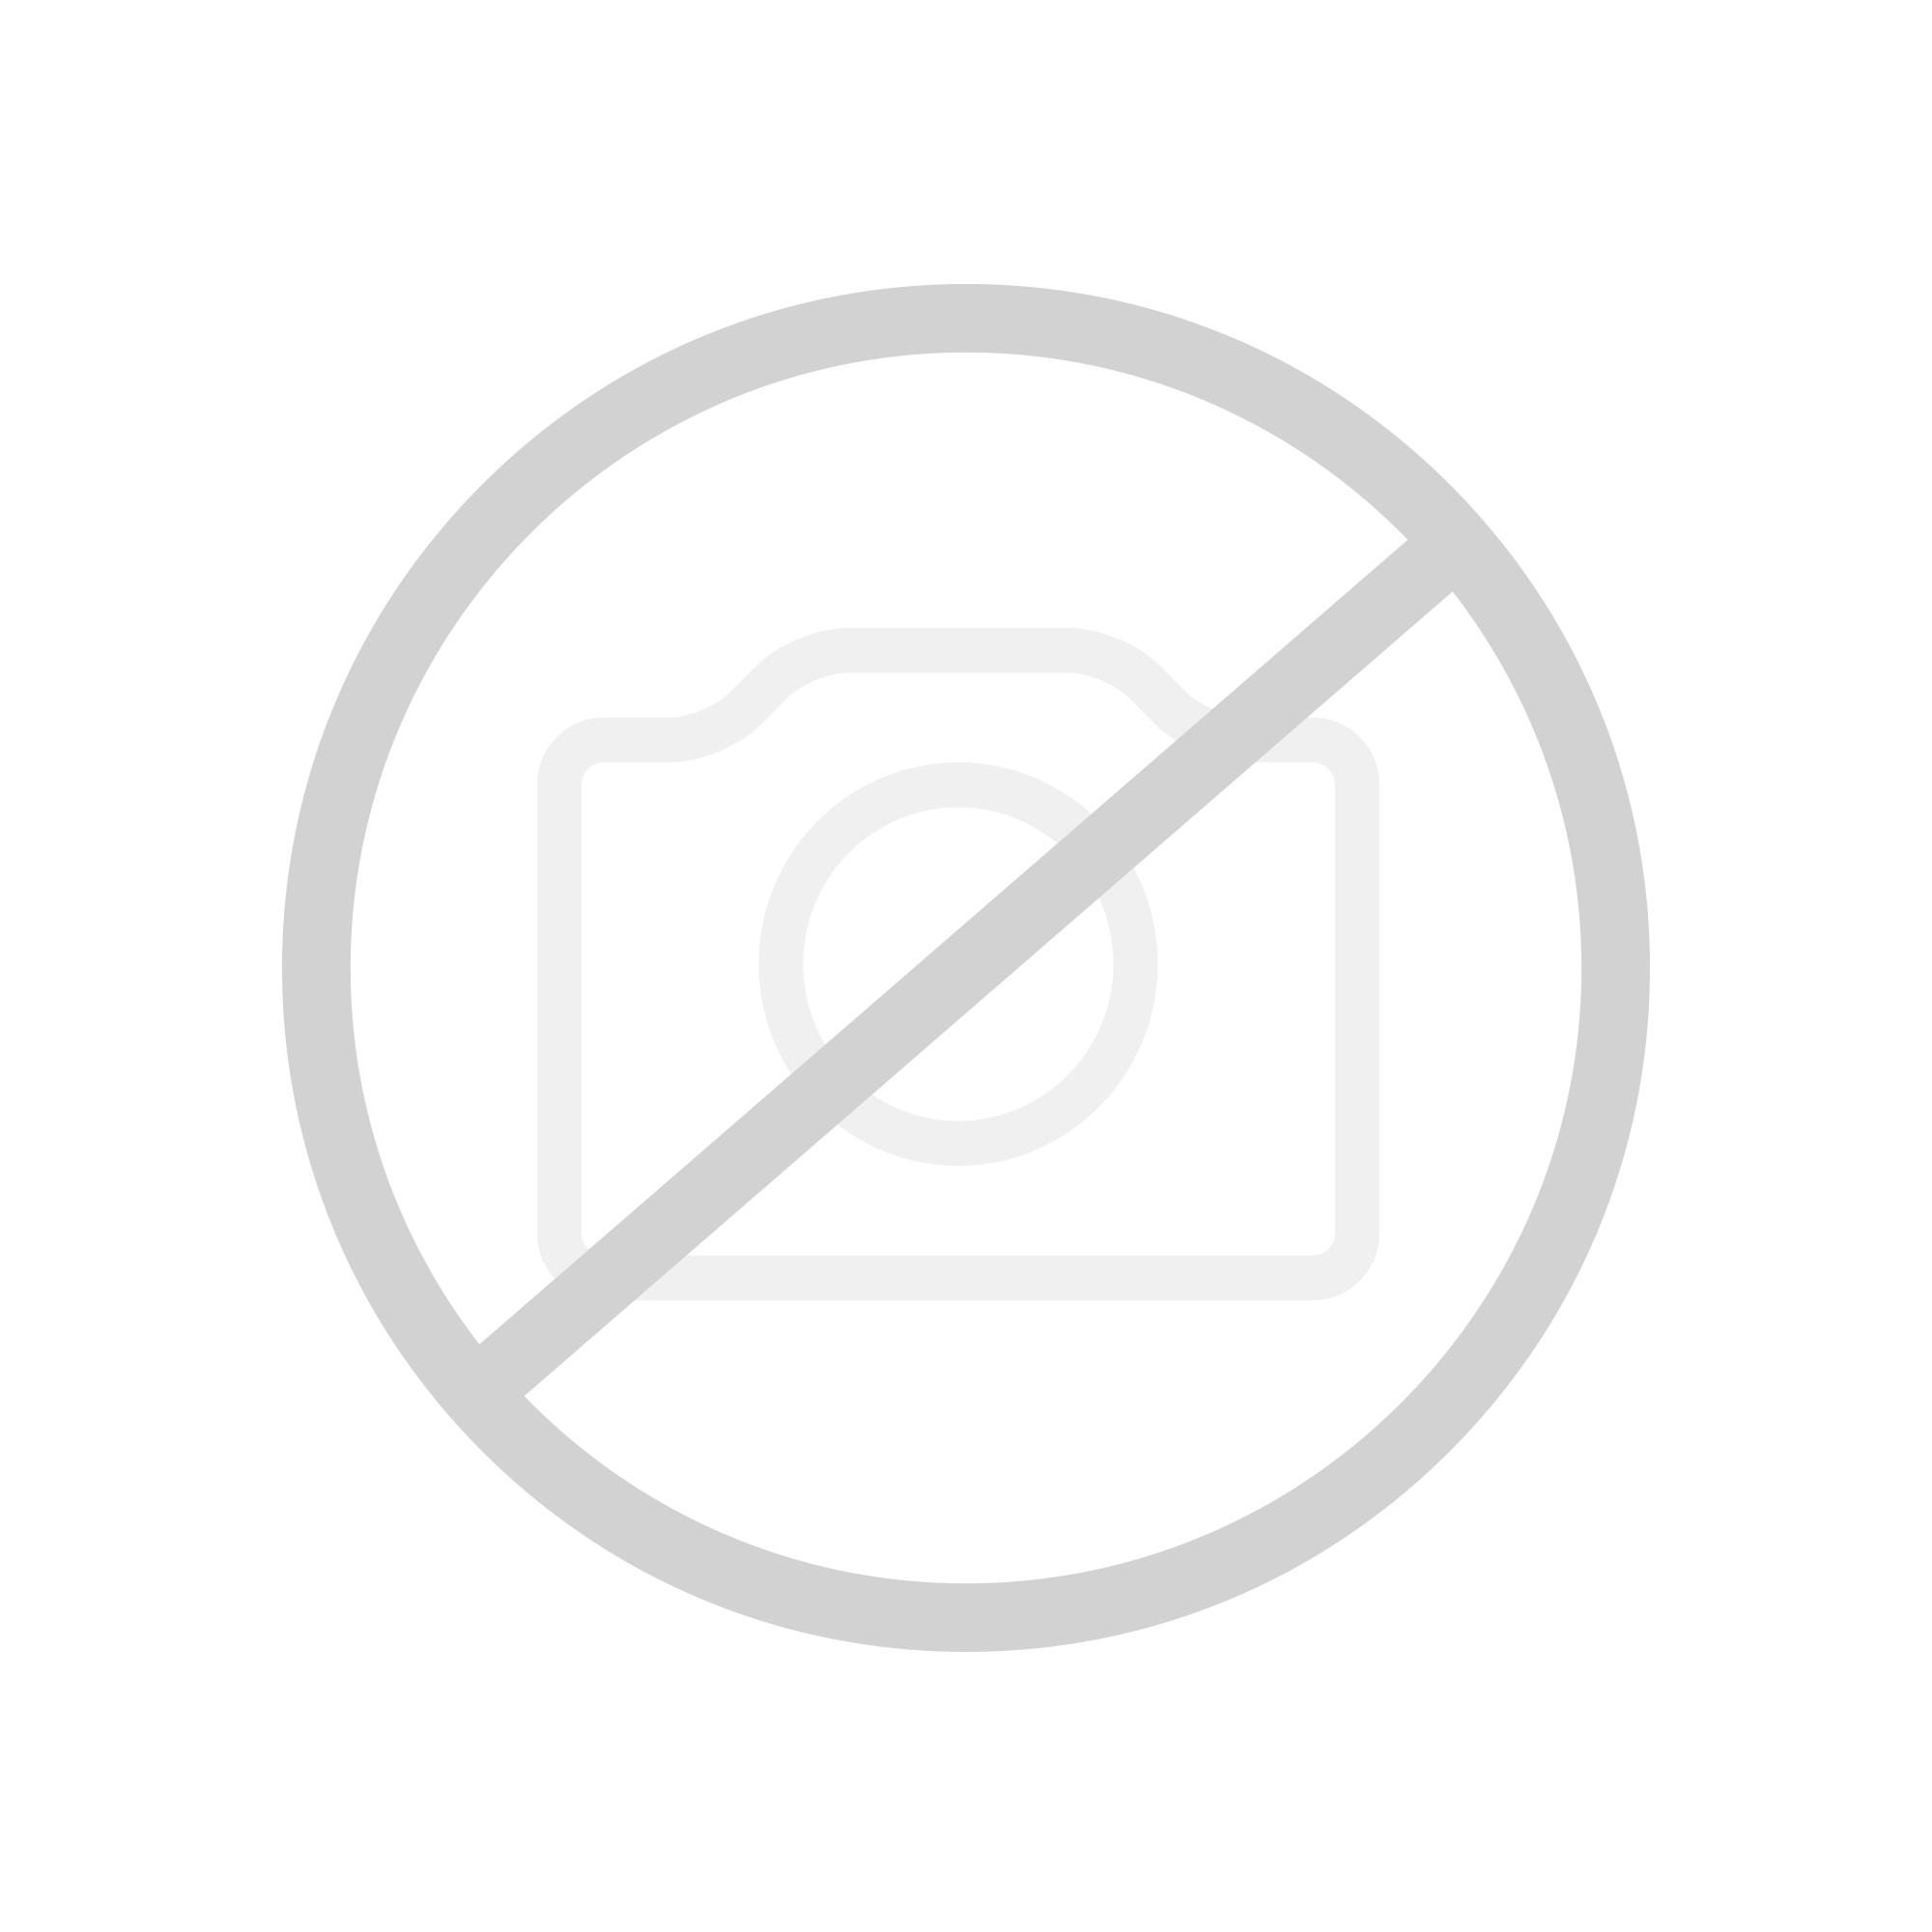 Tellkamp Easy freistehende Oval Badewanne L:170 B: 80 H: 60 cm 0100-076-A/CR